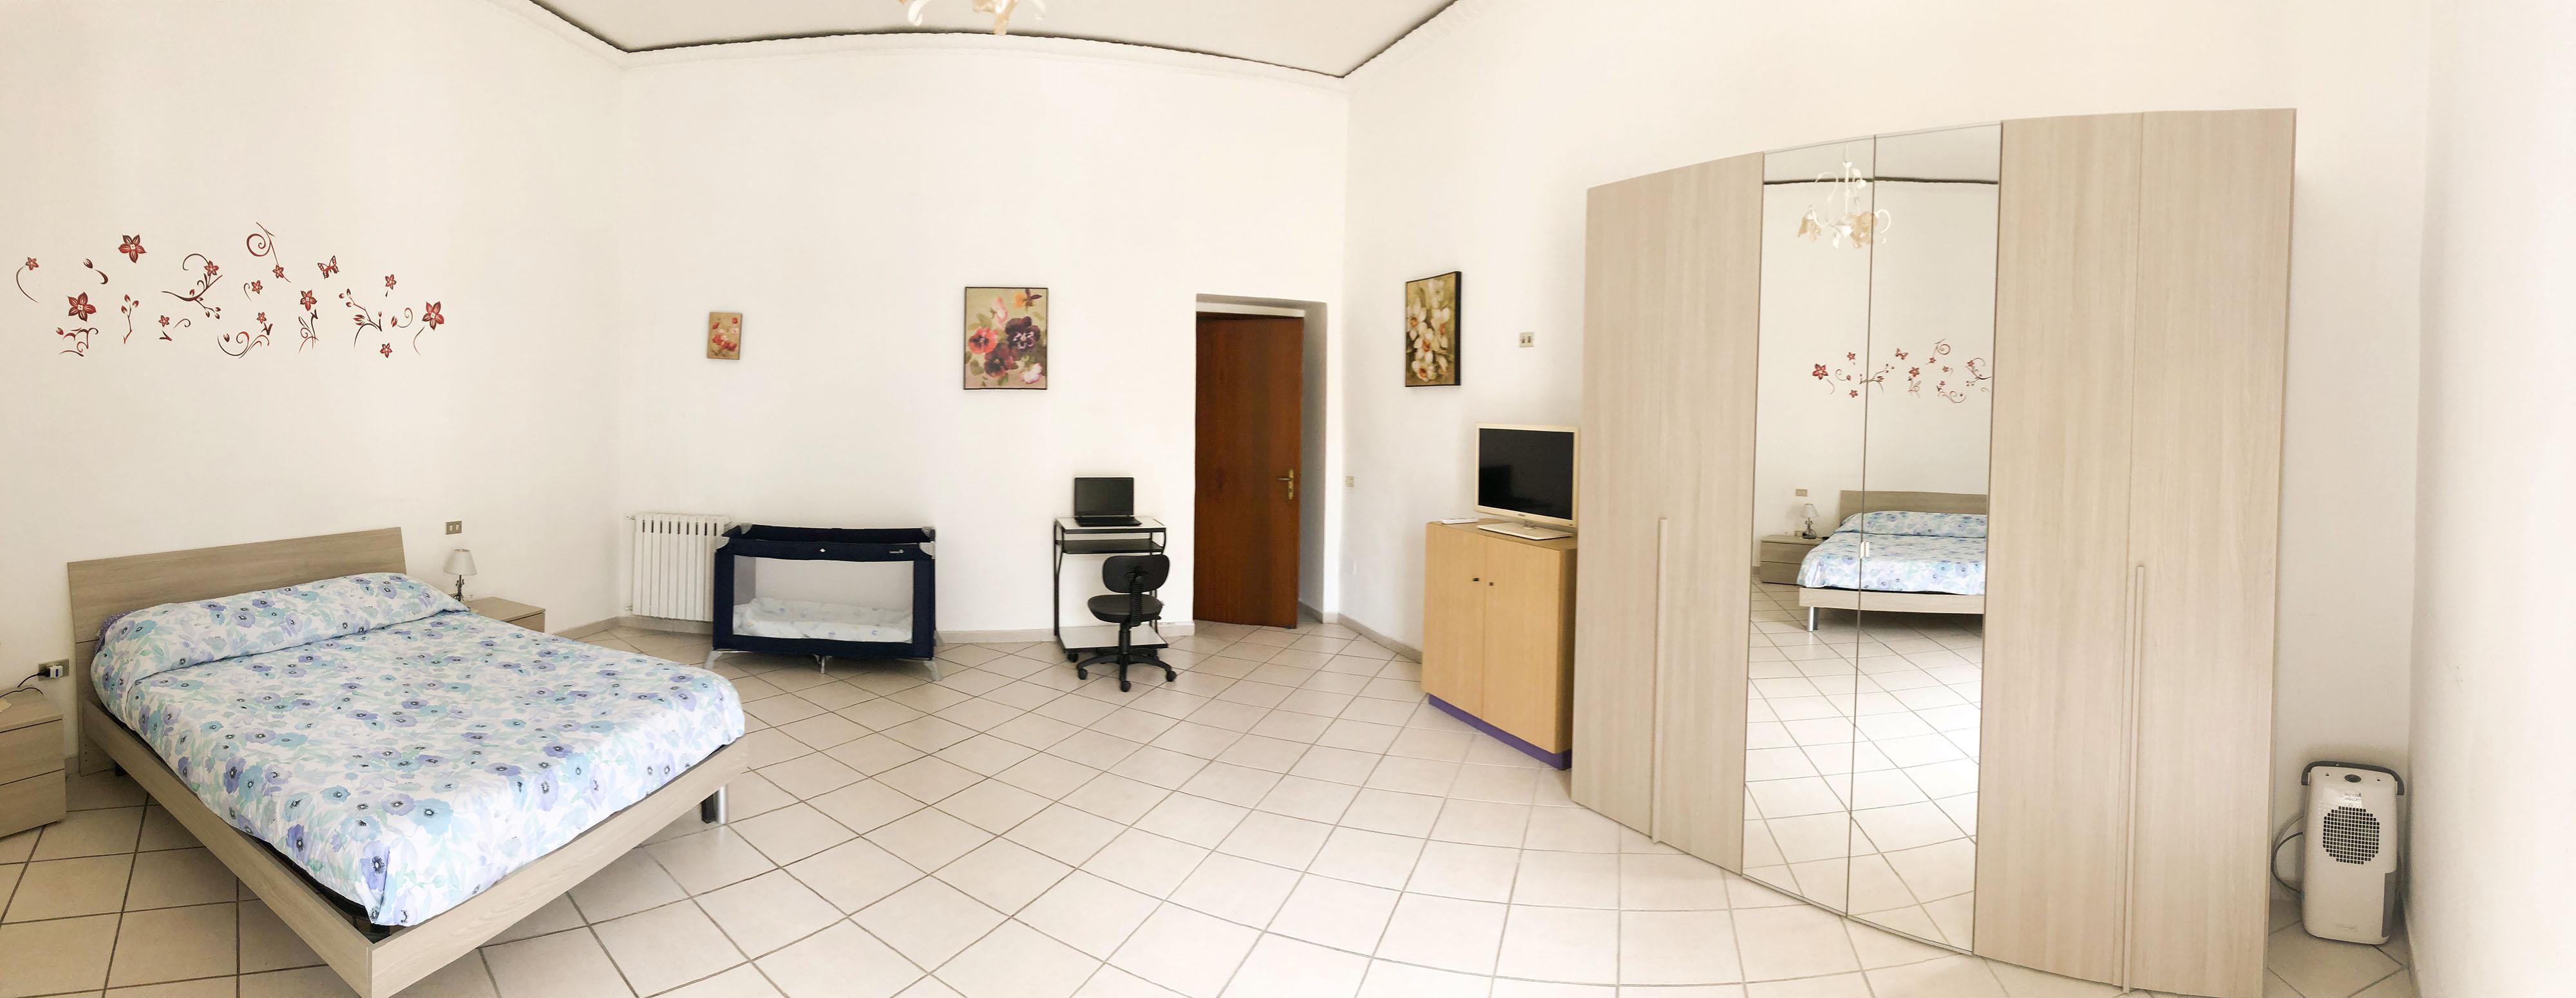 Cucine Usate Campania Napoli andrea's house - apartments for rent in napoli, campania, italy